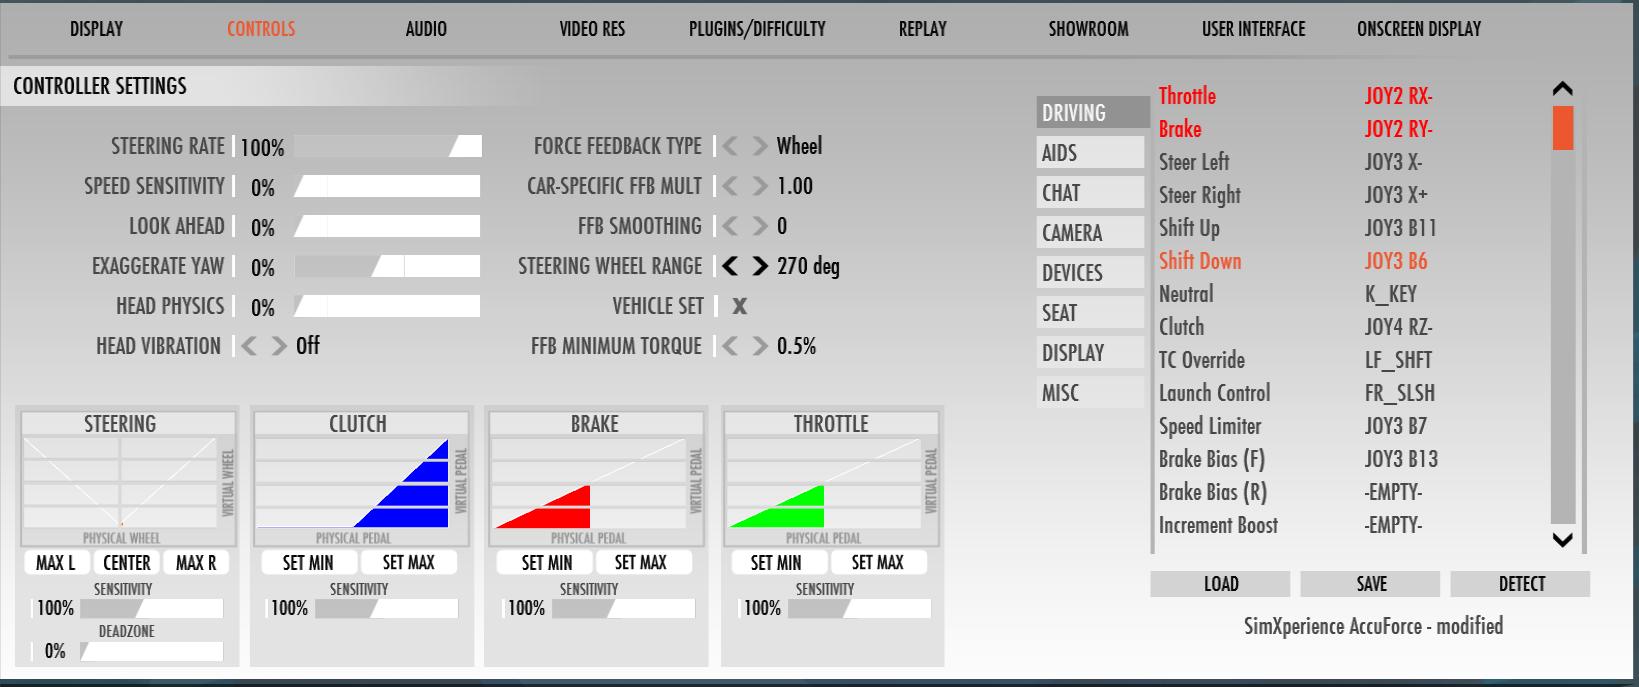 AccuForce/SimCommander settings for rF2 | Studio-397 Forum